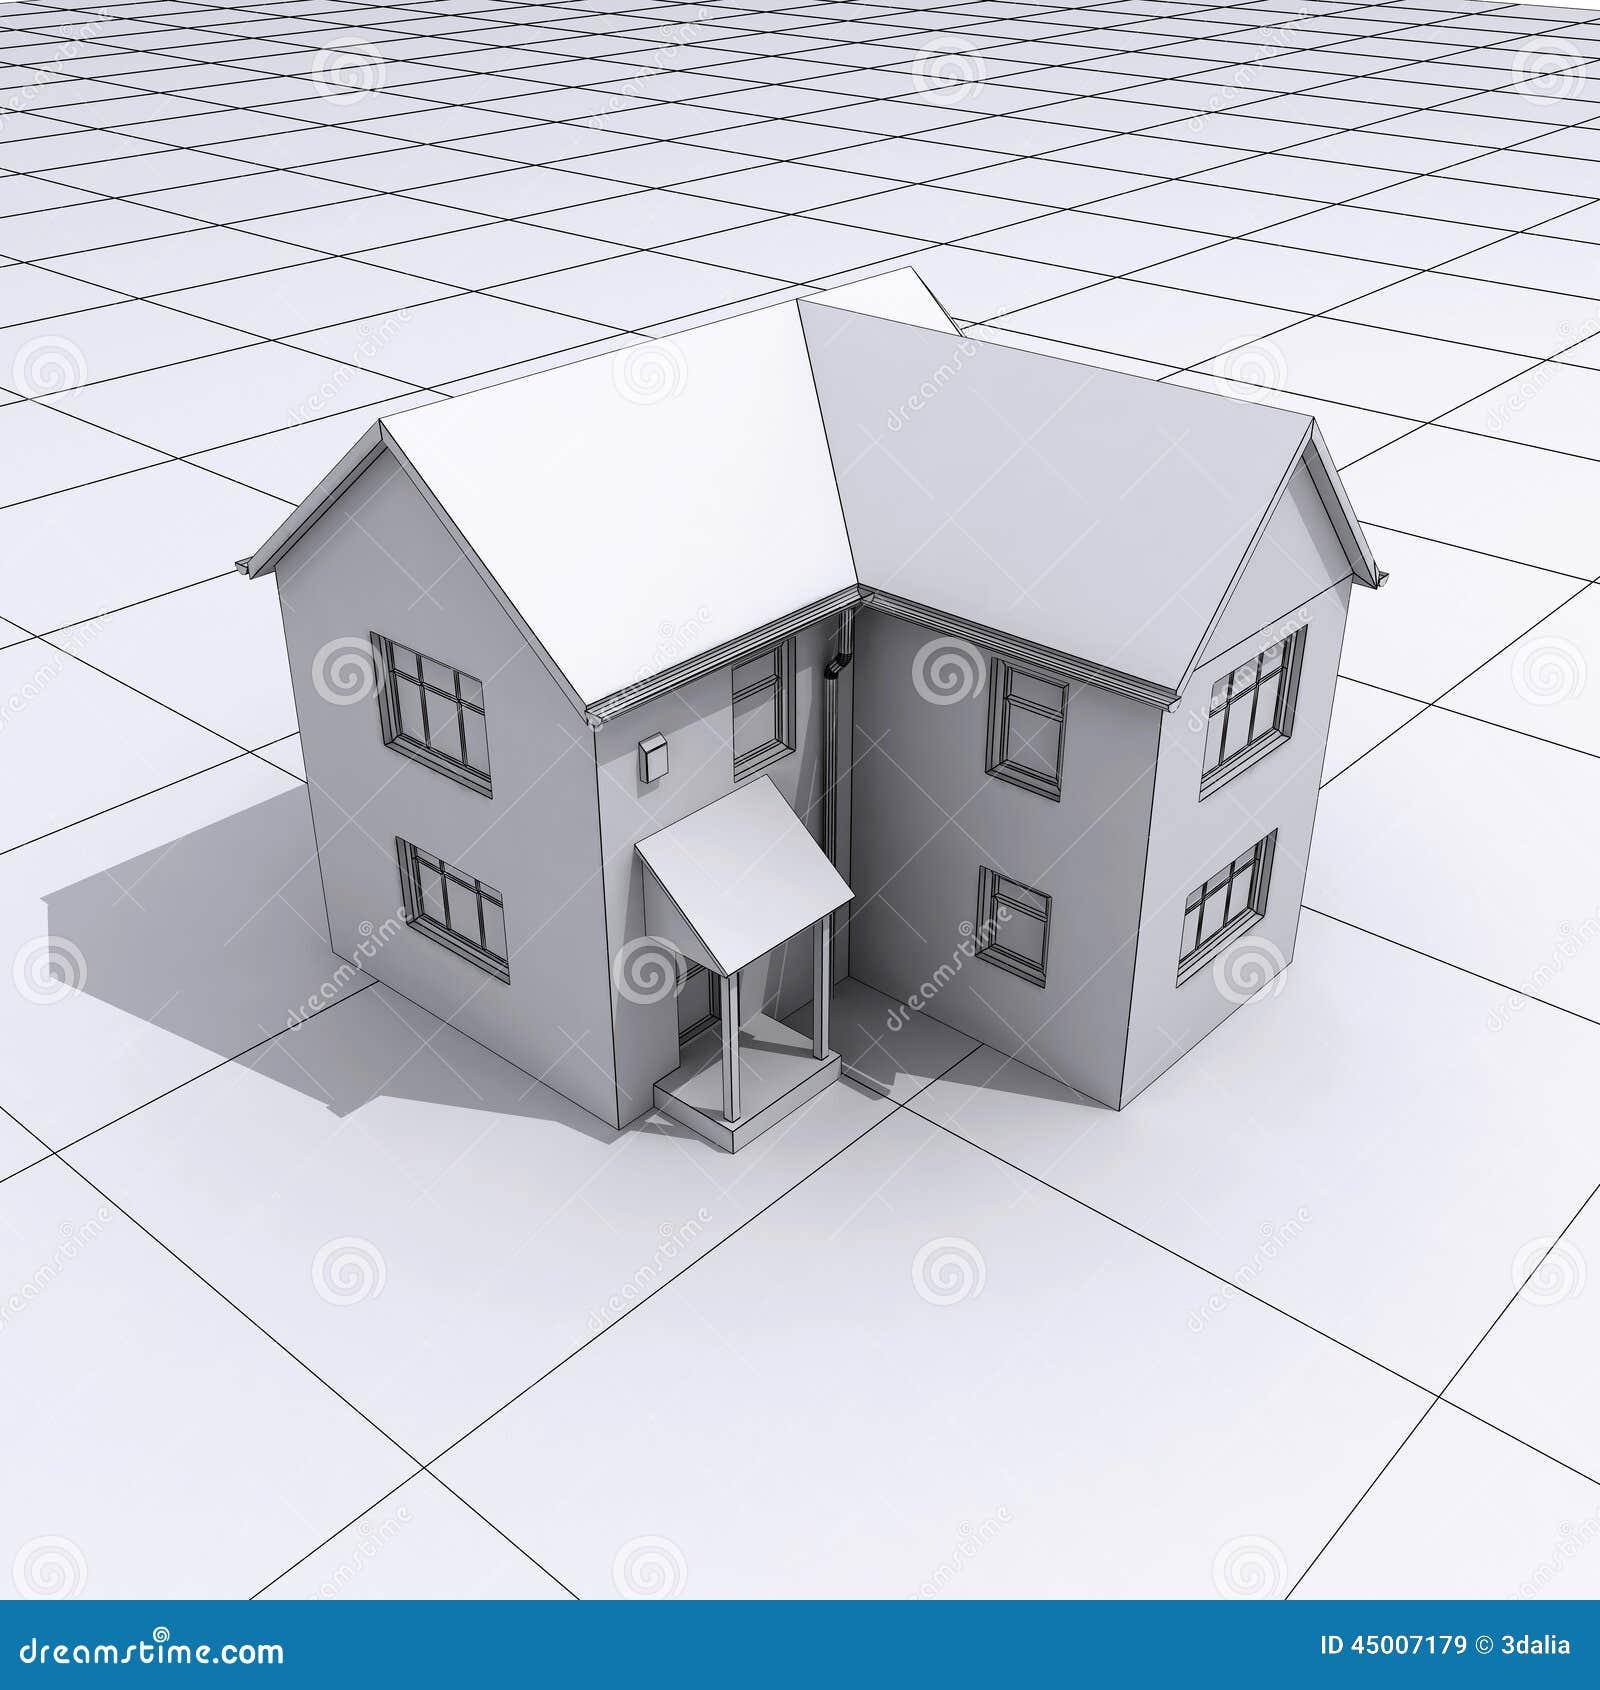 Comfortable Av Jennings Homes Designs Images - Home Decorating Ideas ...